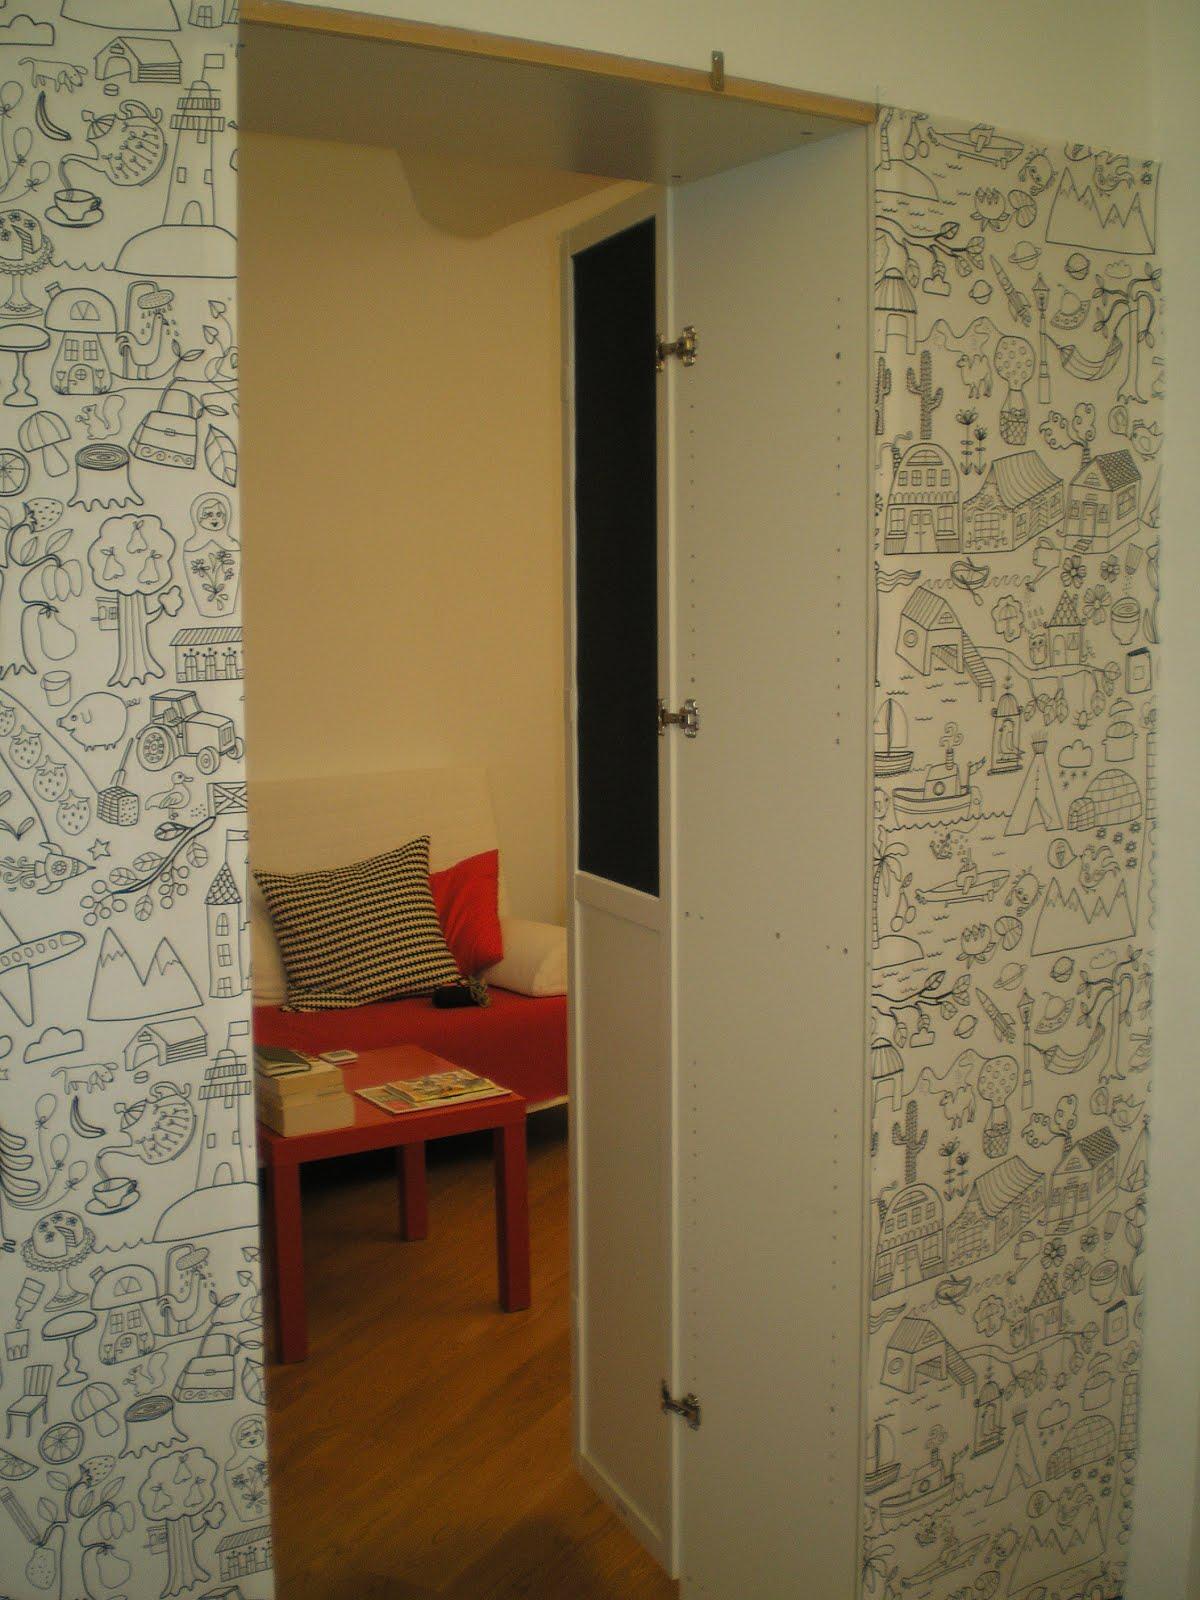 Living Room Design Using Ikea